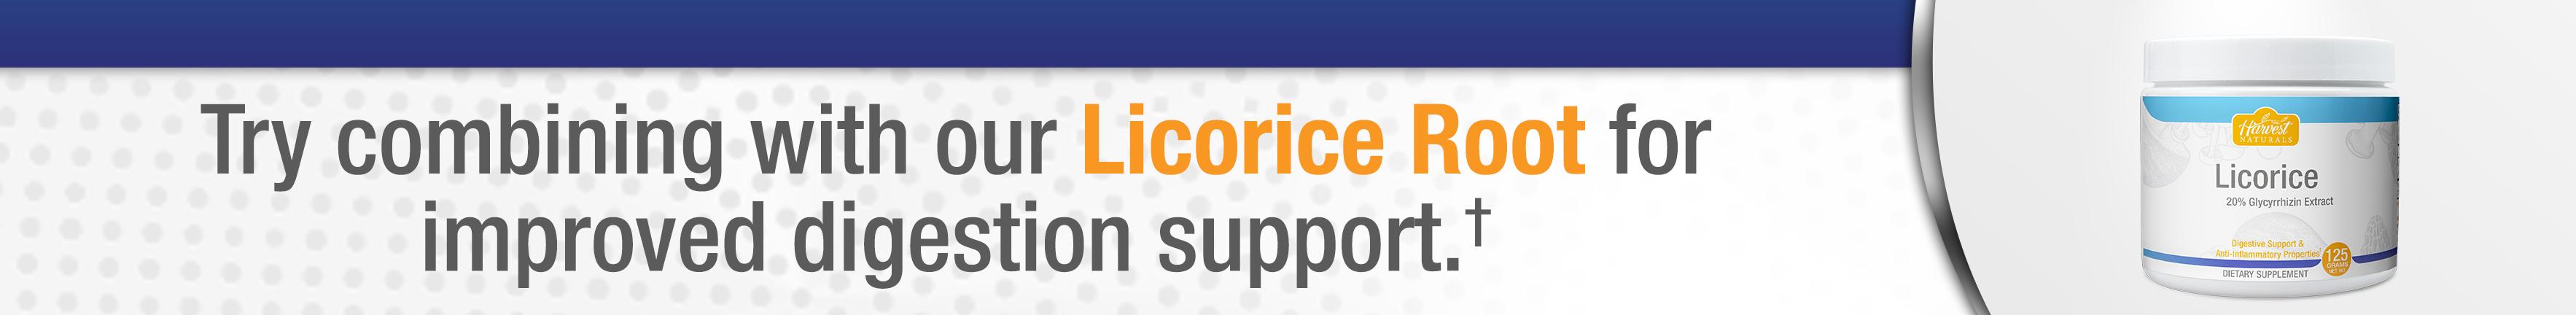 licorice-consider.jpg